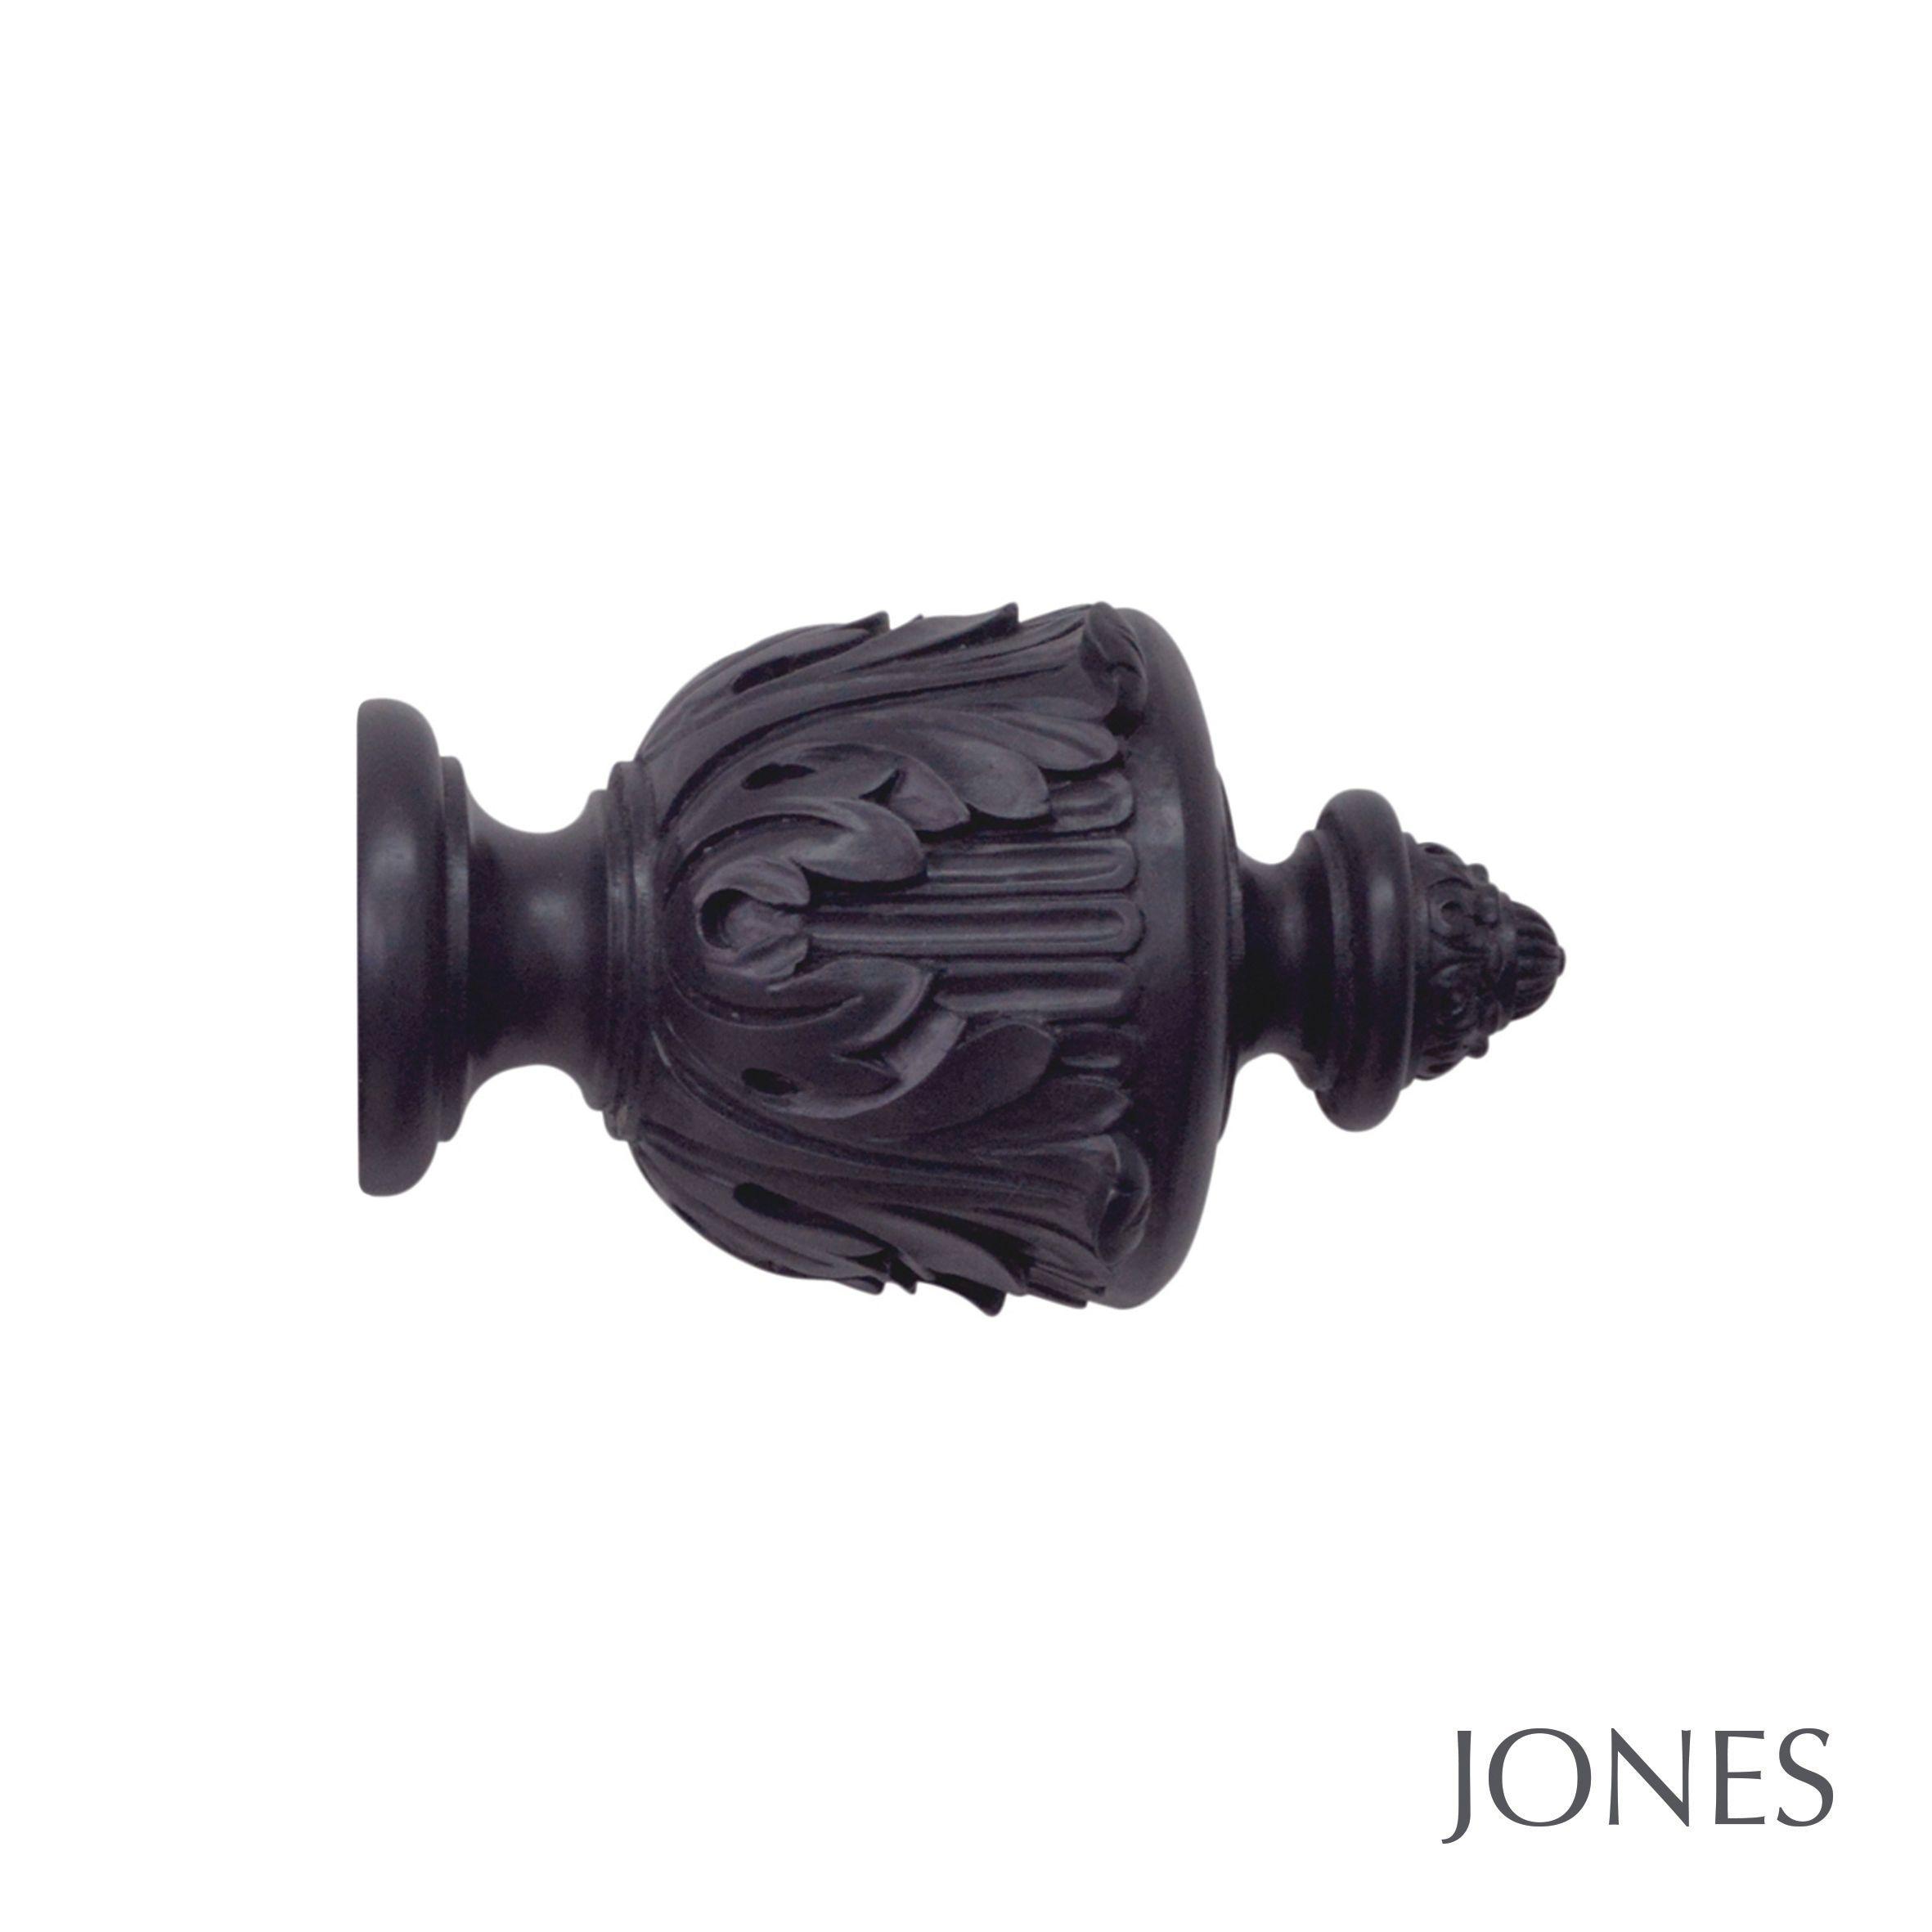 50mm Jones Estate Acanthus Finial juniper